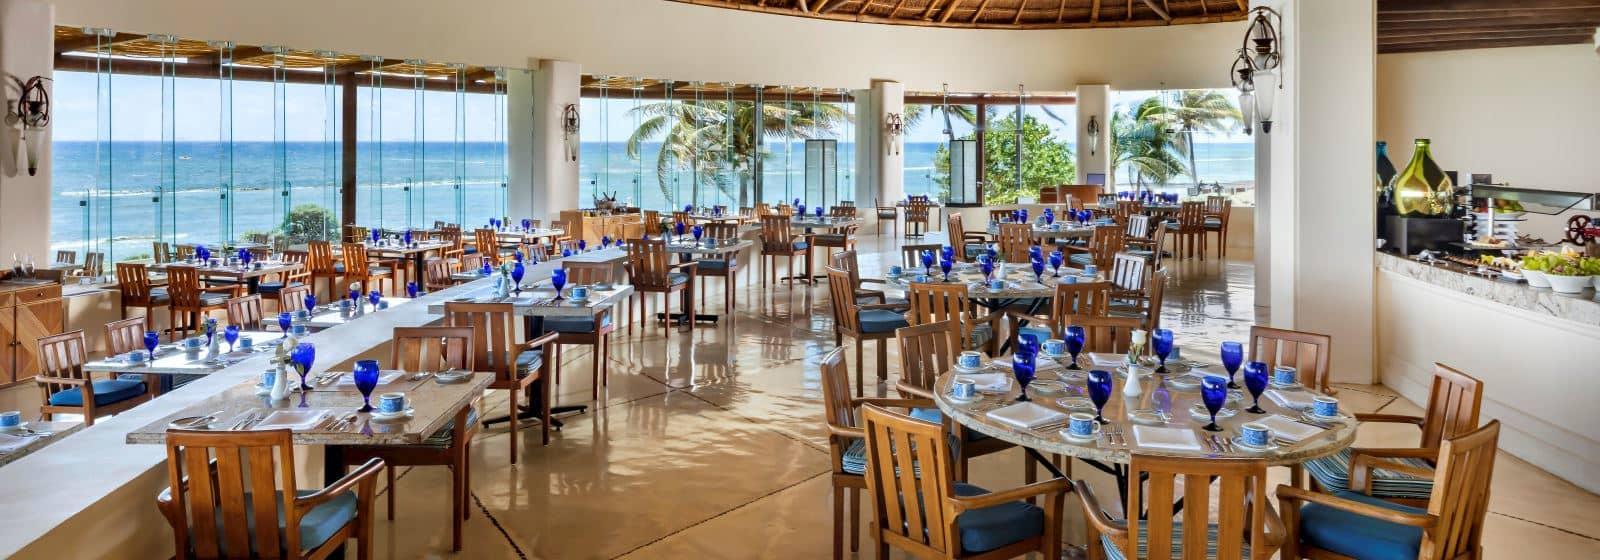 Restaurante Azul en Grand Velas Riviera Maya